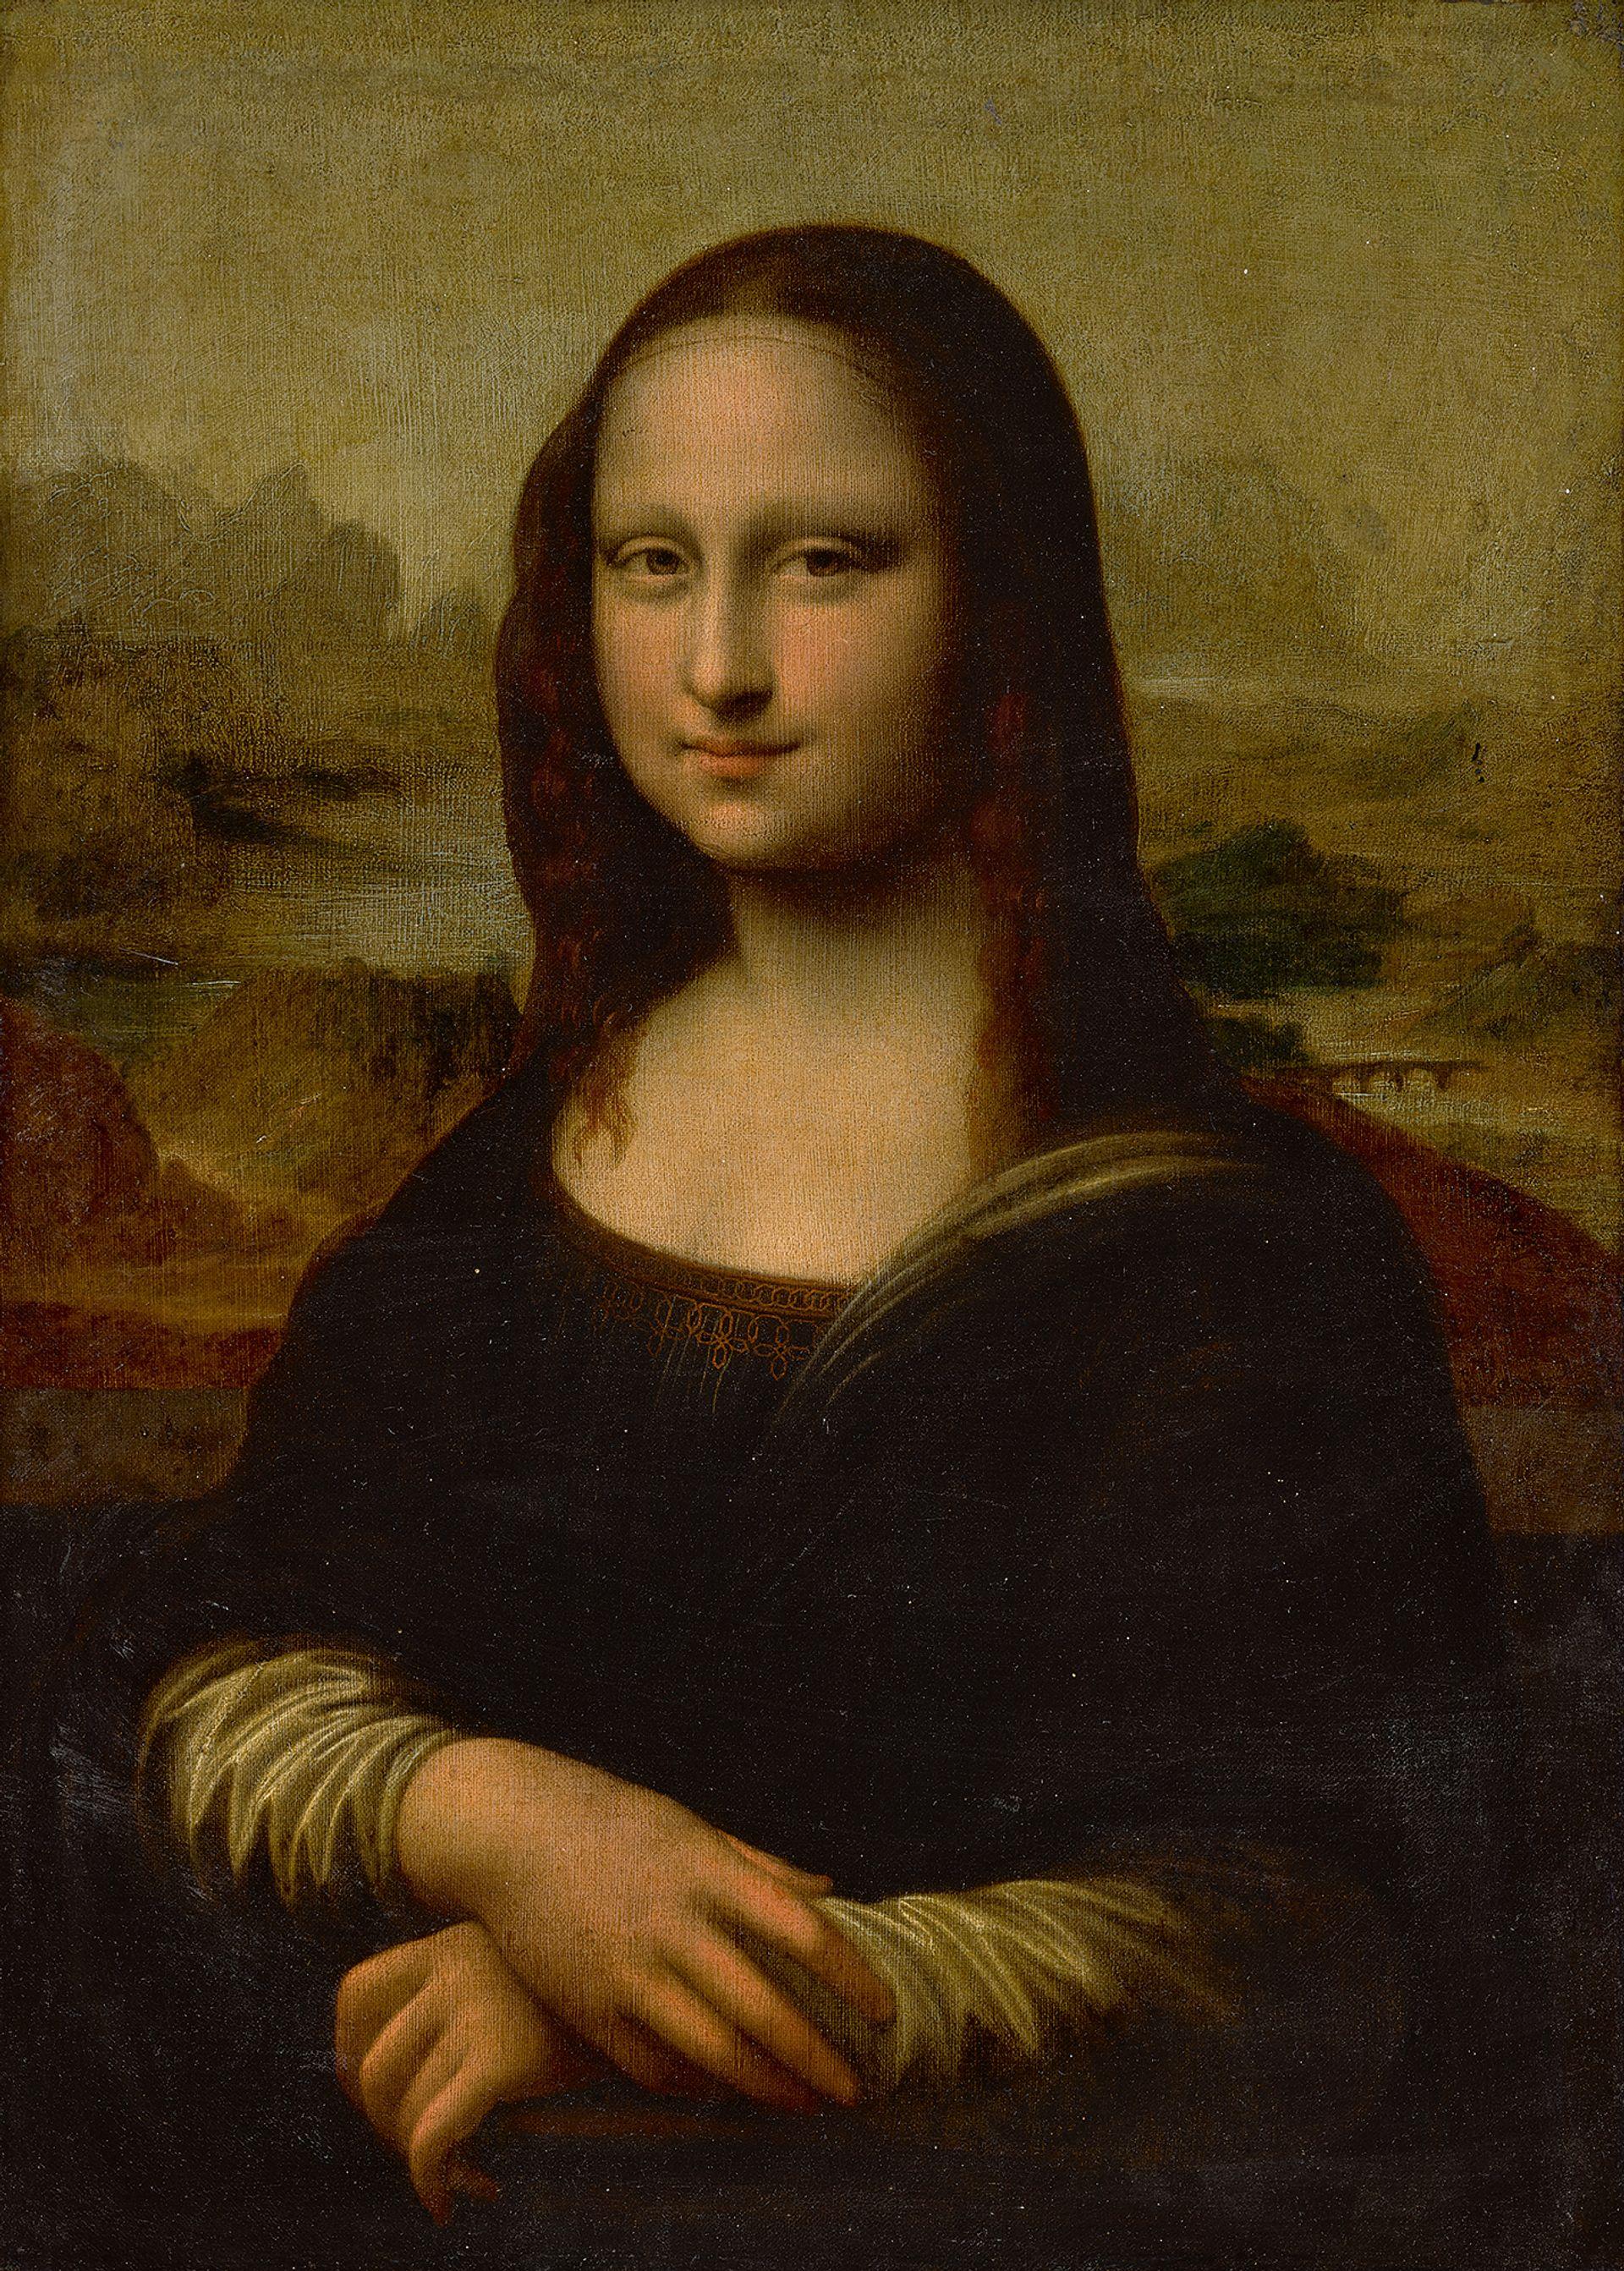 Mona Lisa by a follower of Leonardo da Vinci (17th century) Courtesy of Sotheby's